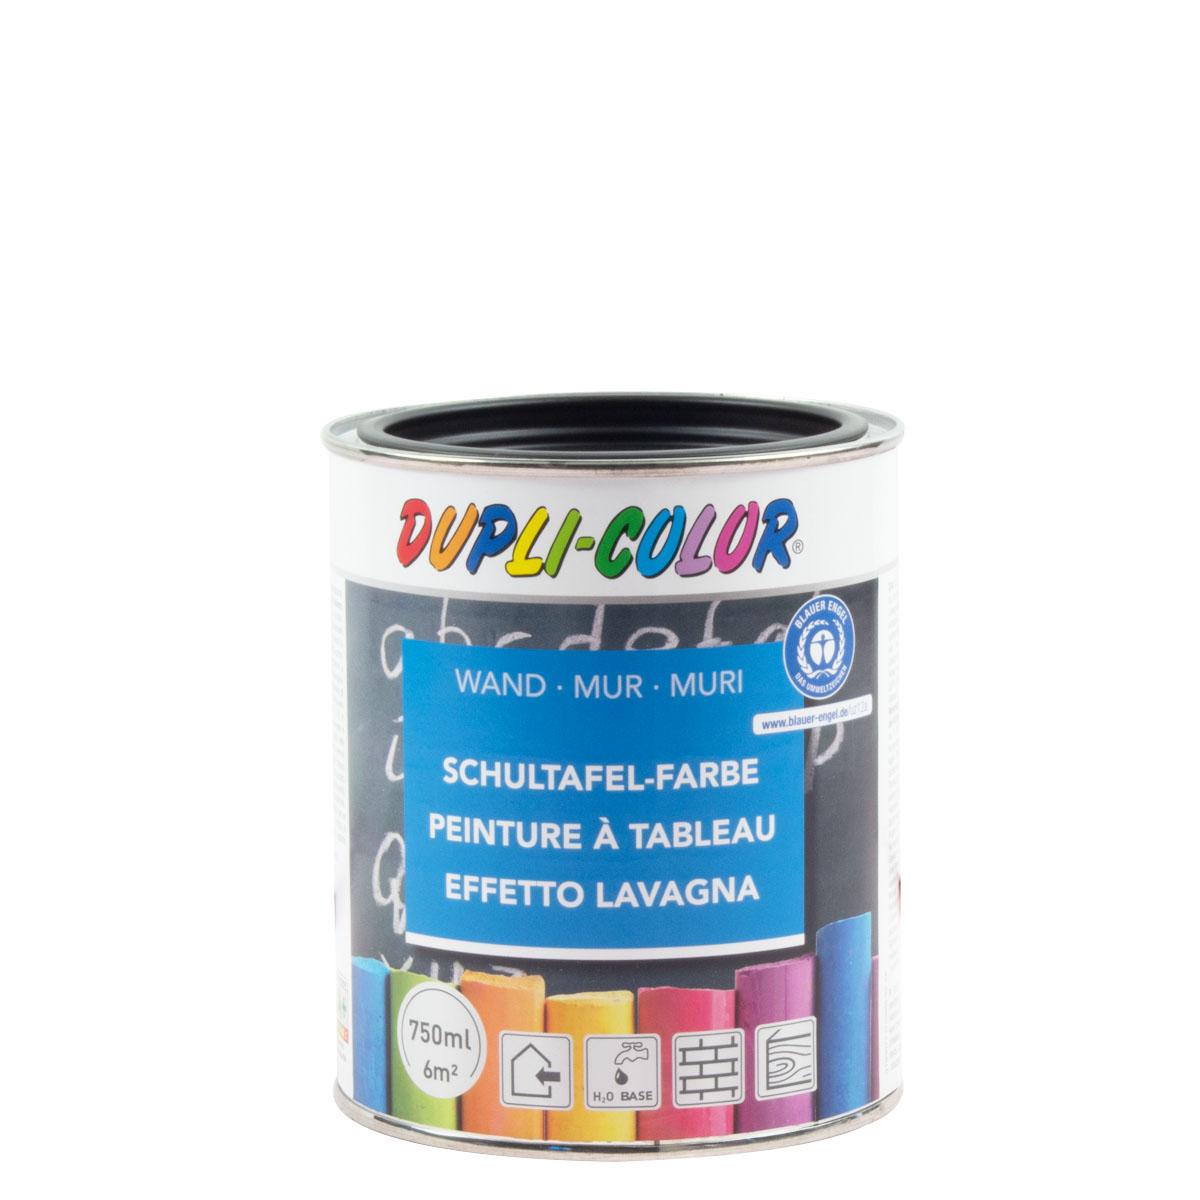 Dupli-Color Schultafel-Farbe schwarz 750ml , Schultafellack